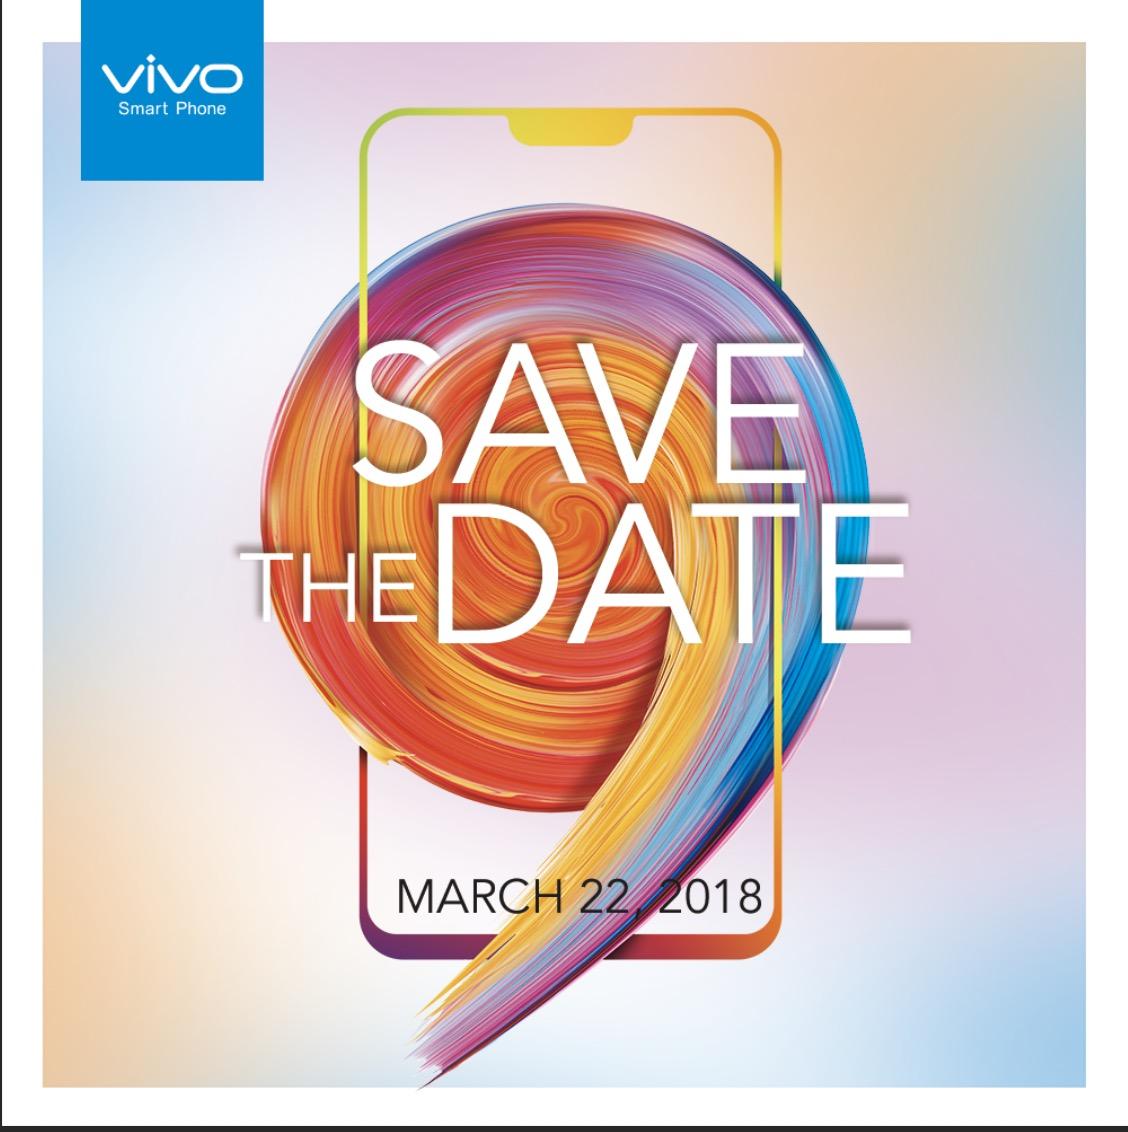 Vivo's Newest Flagship Phone